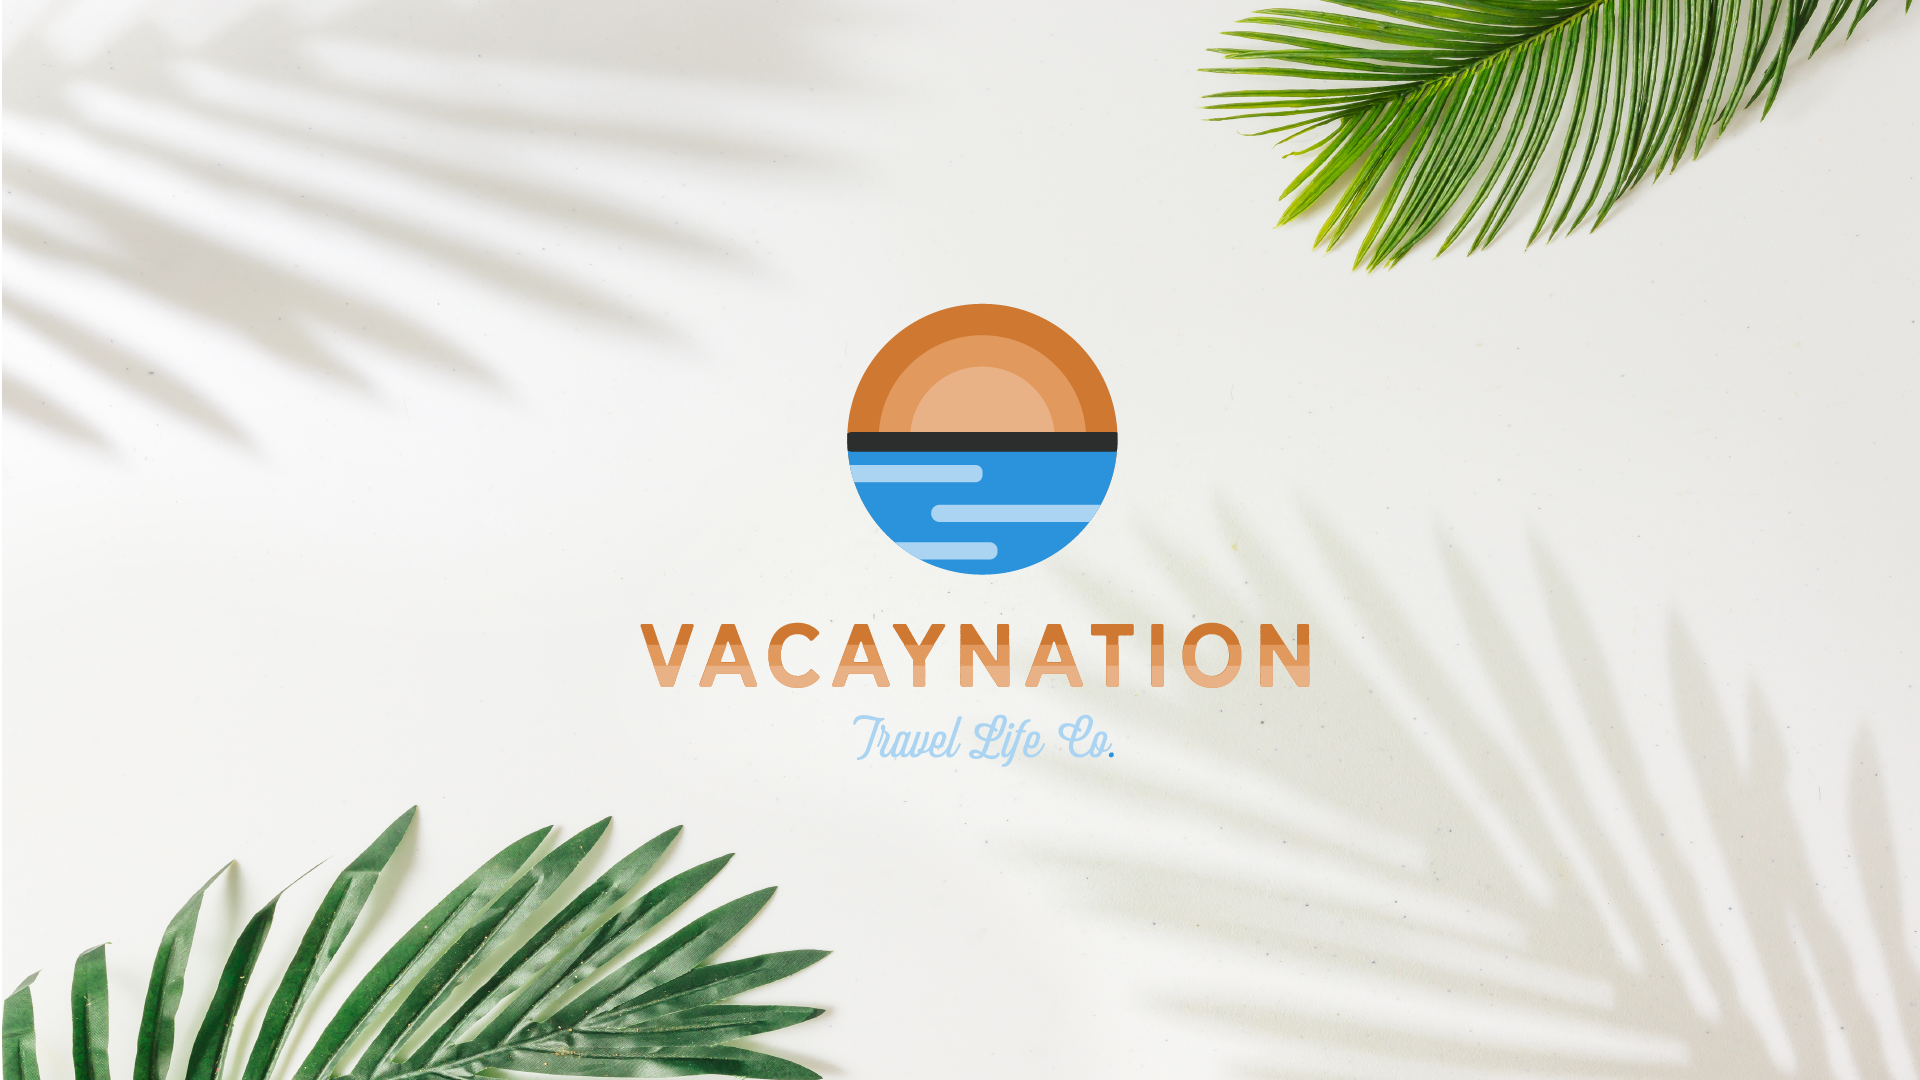 Vacaynation004Artboard 1.png